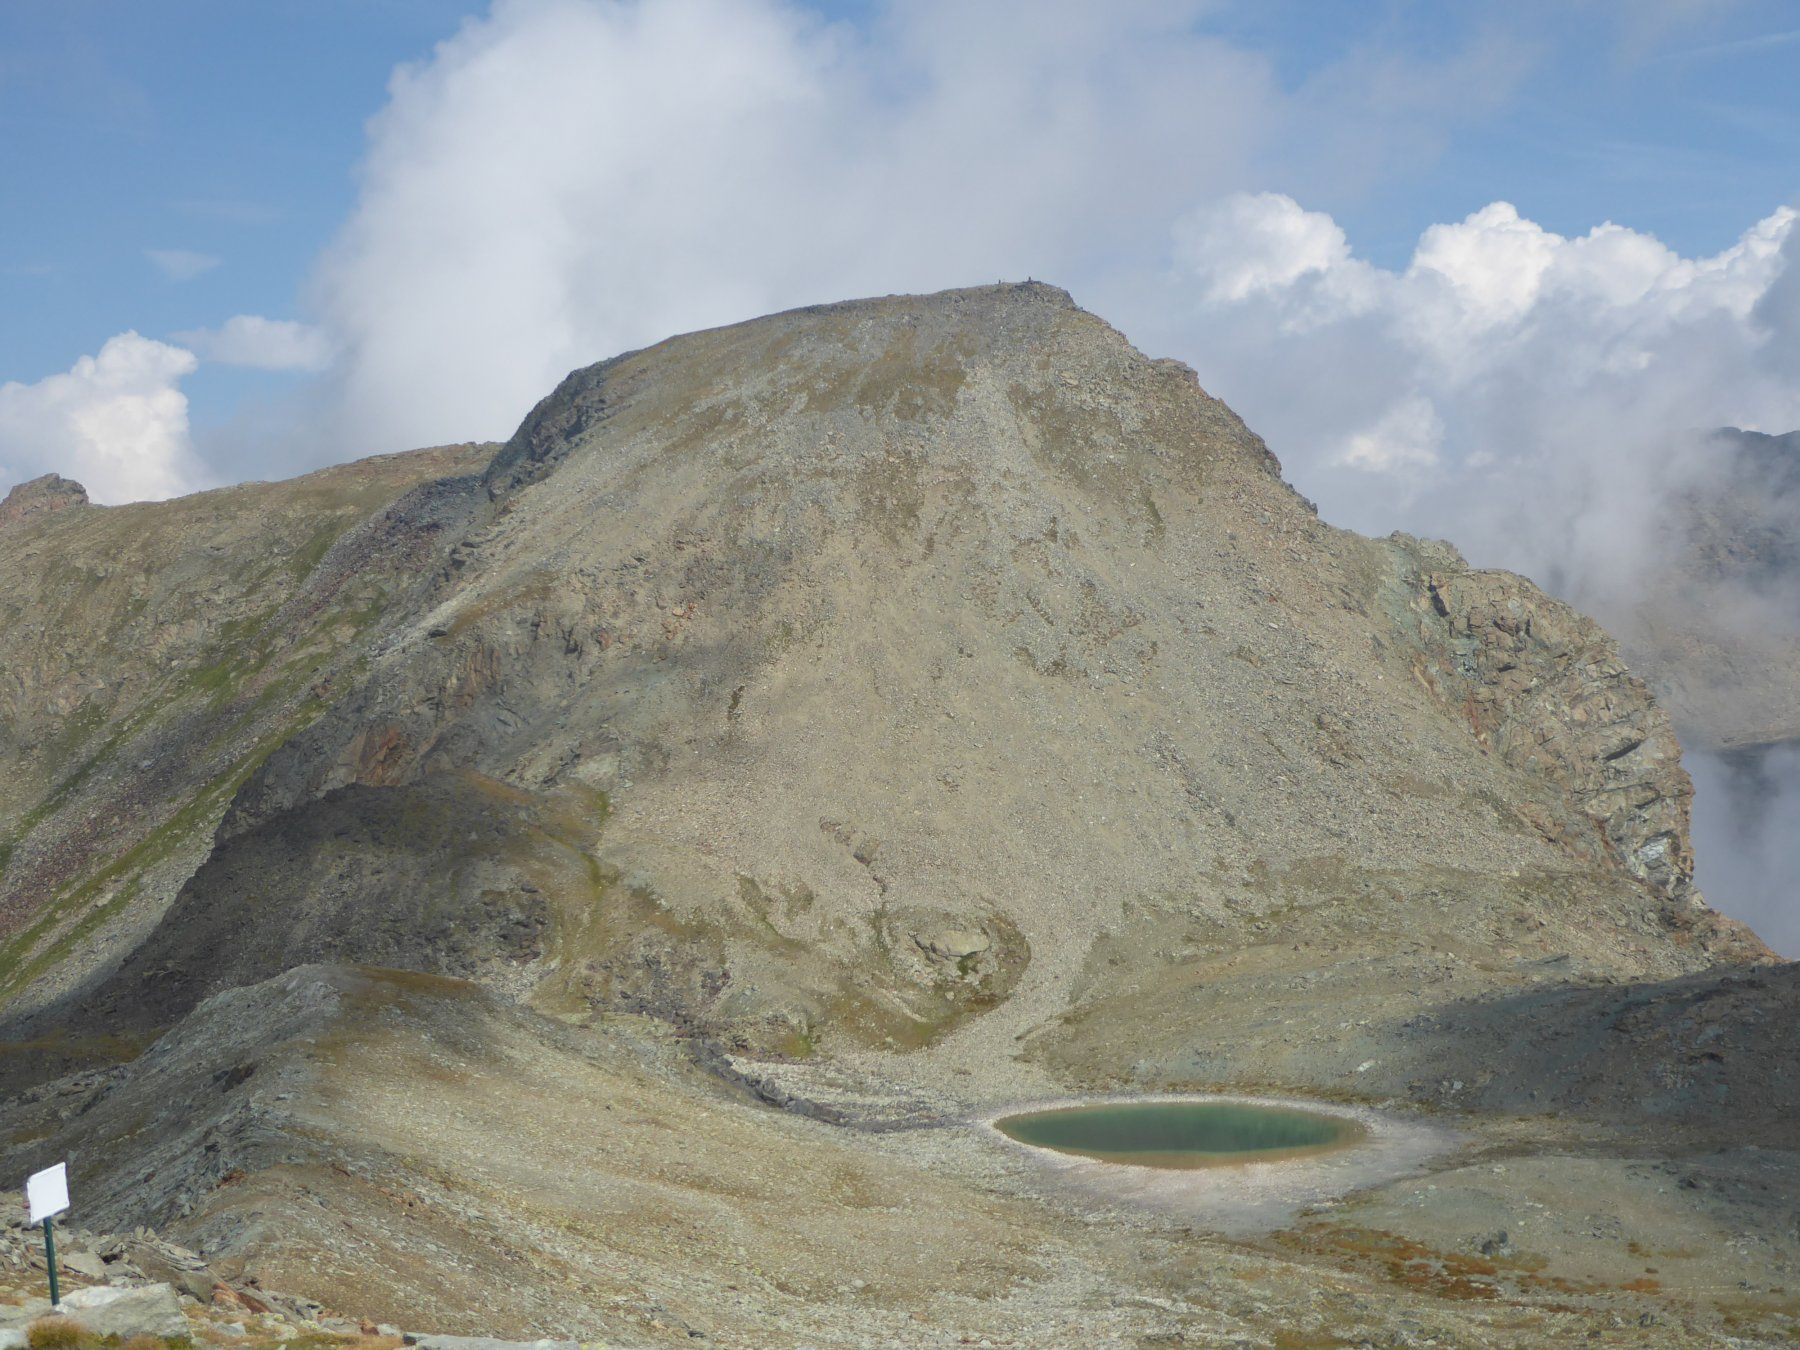 monte Ivertaz col pendio di salita e lac des Heures